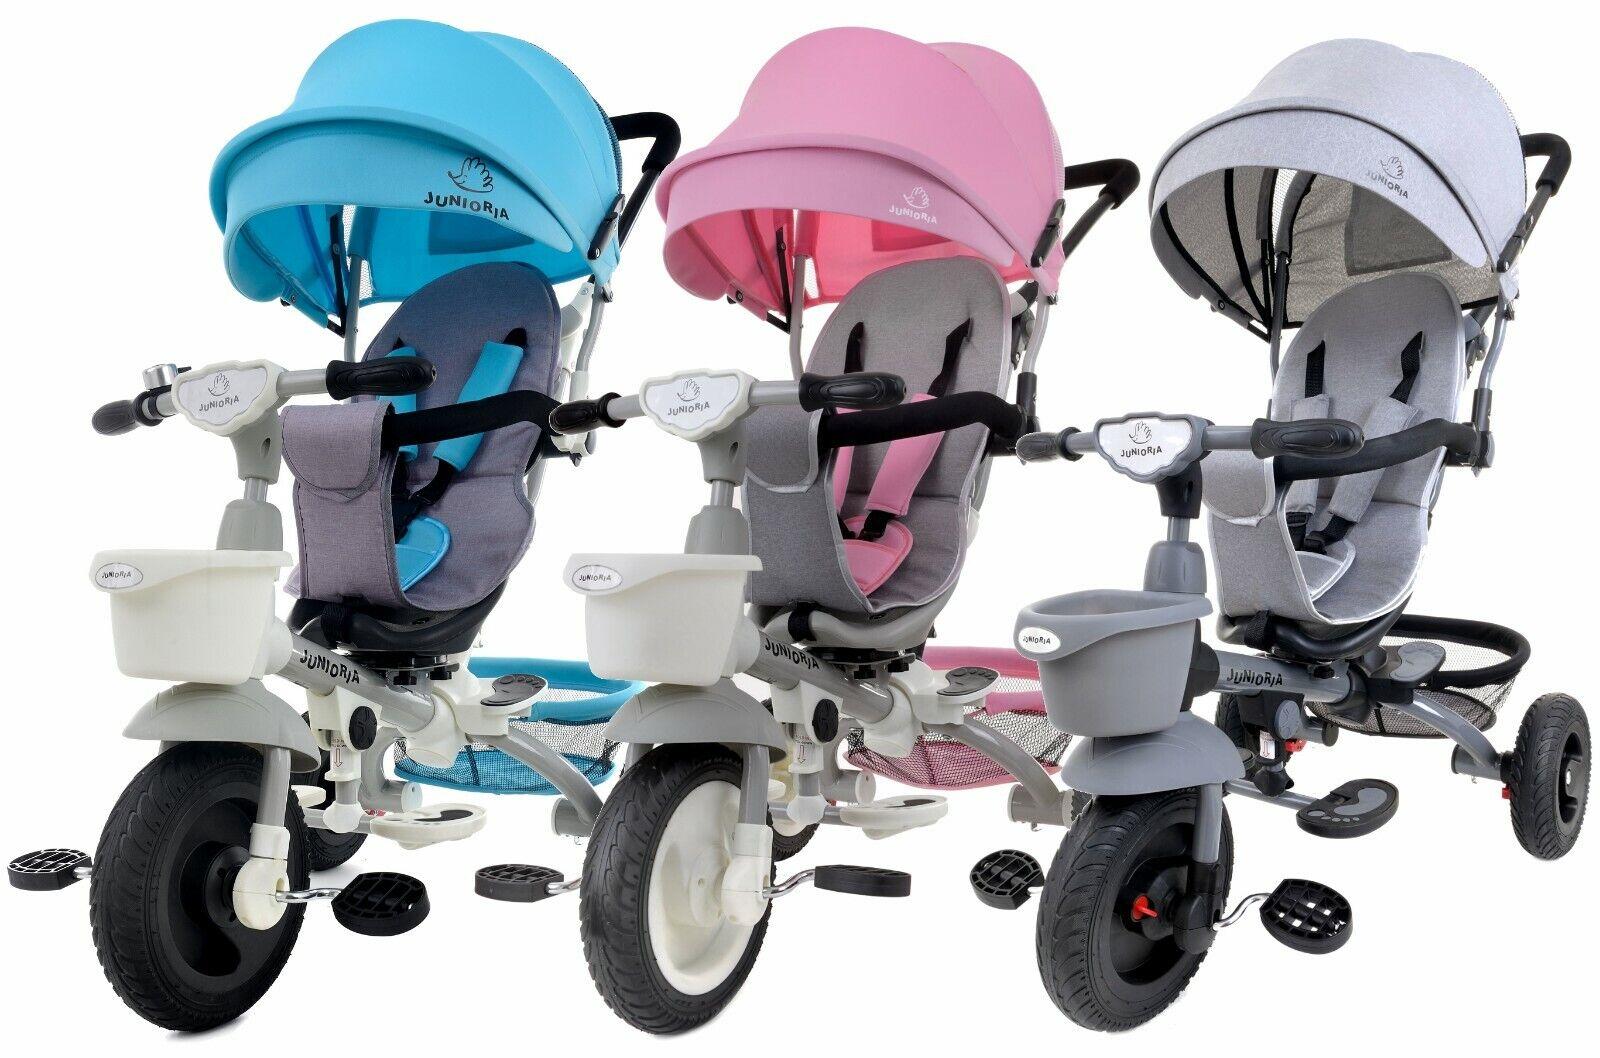 Dreirad Kinderdreirad Fahrrad Bonbon 360 Kinder Lenkstange Baby Kinderwagen